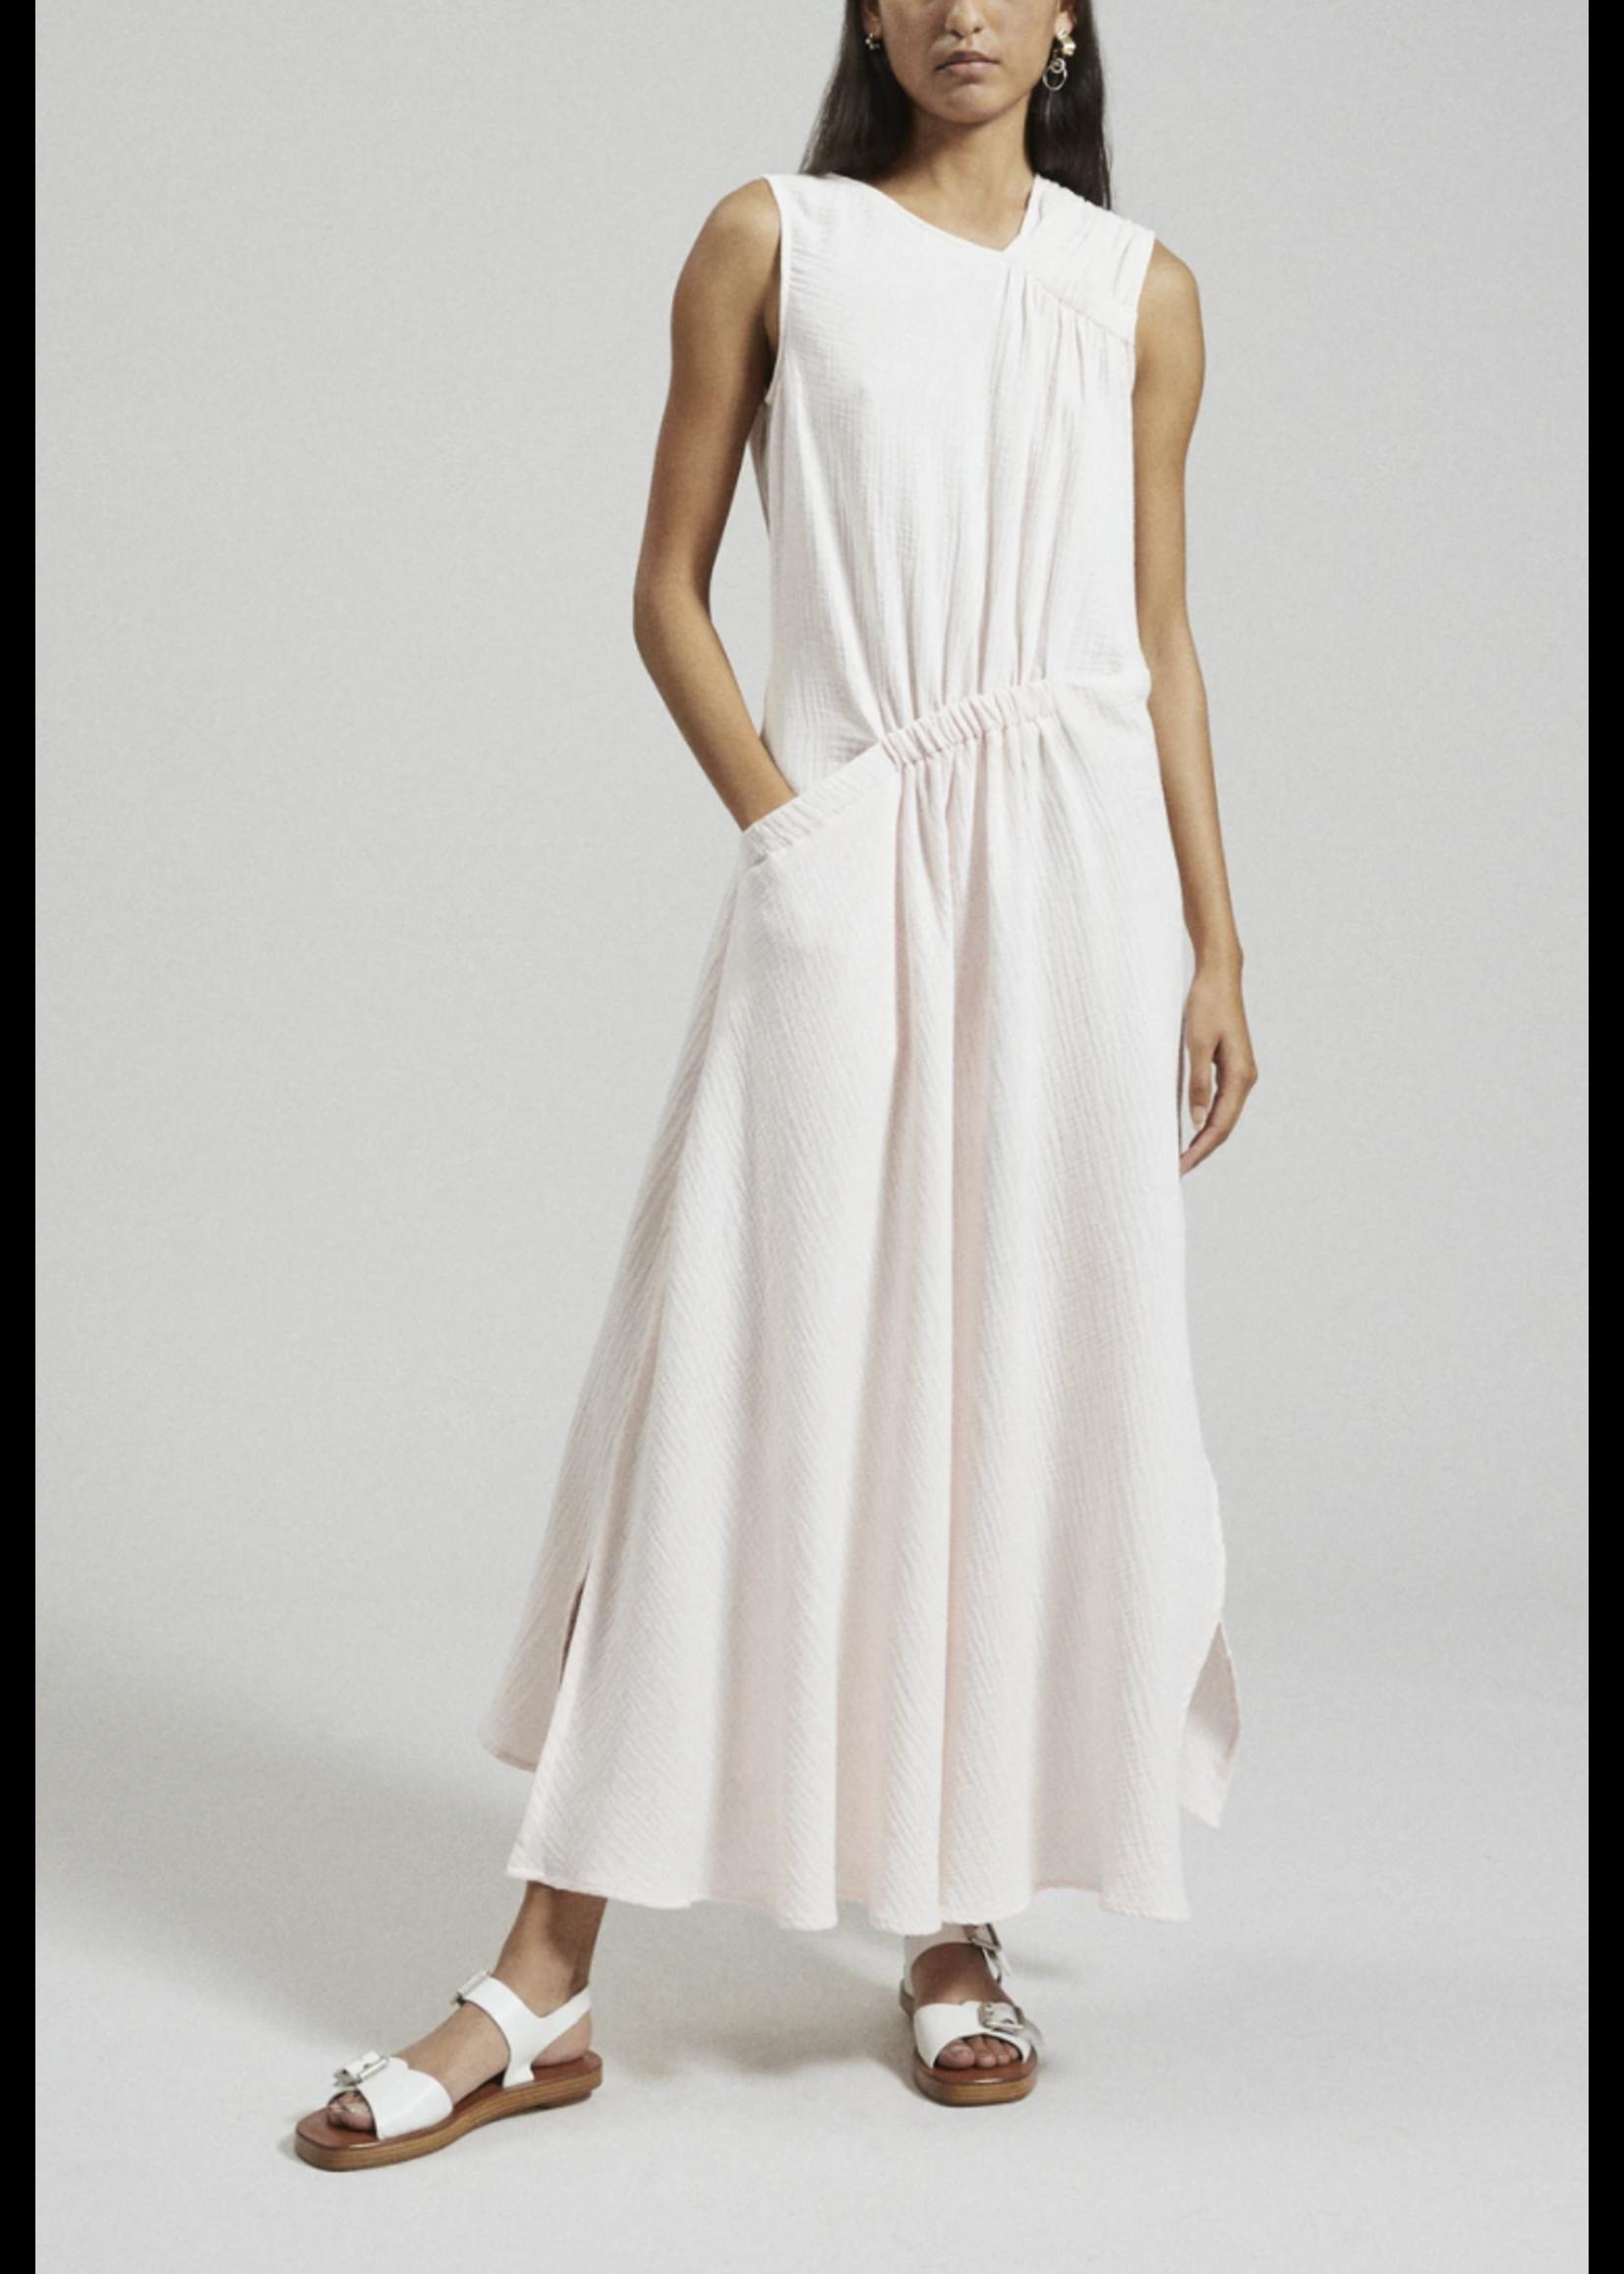 Rachel Comey Slice Dress in Peach